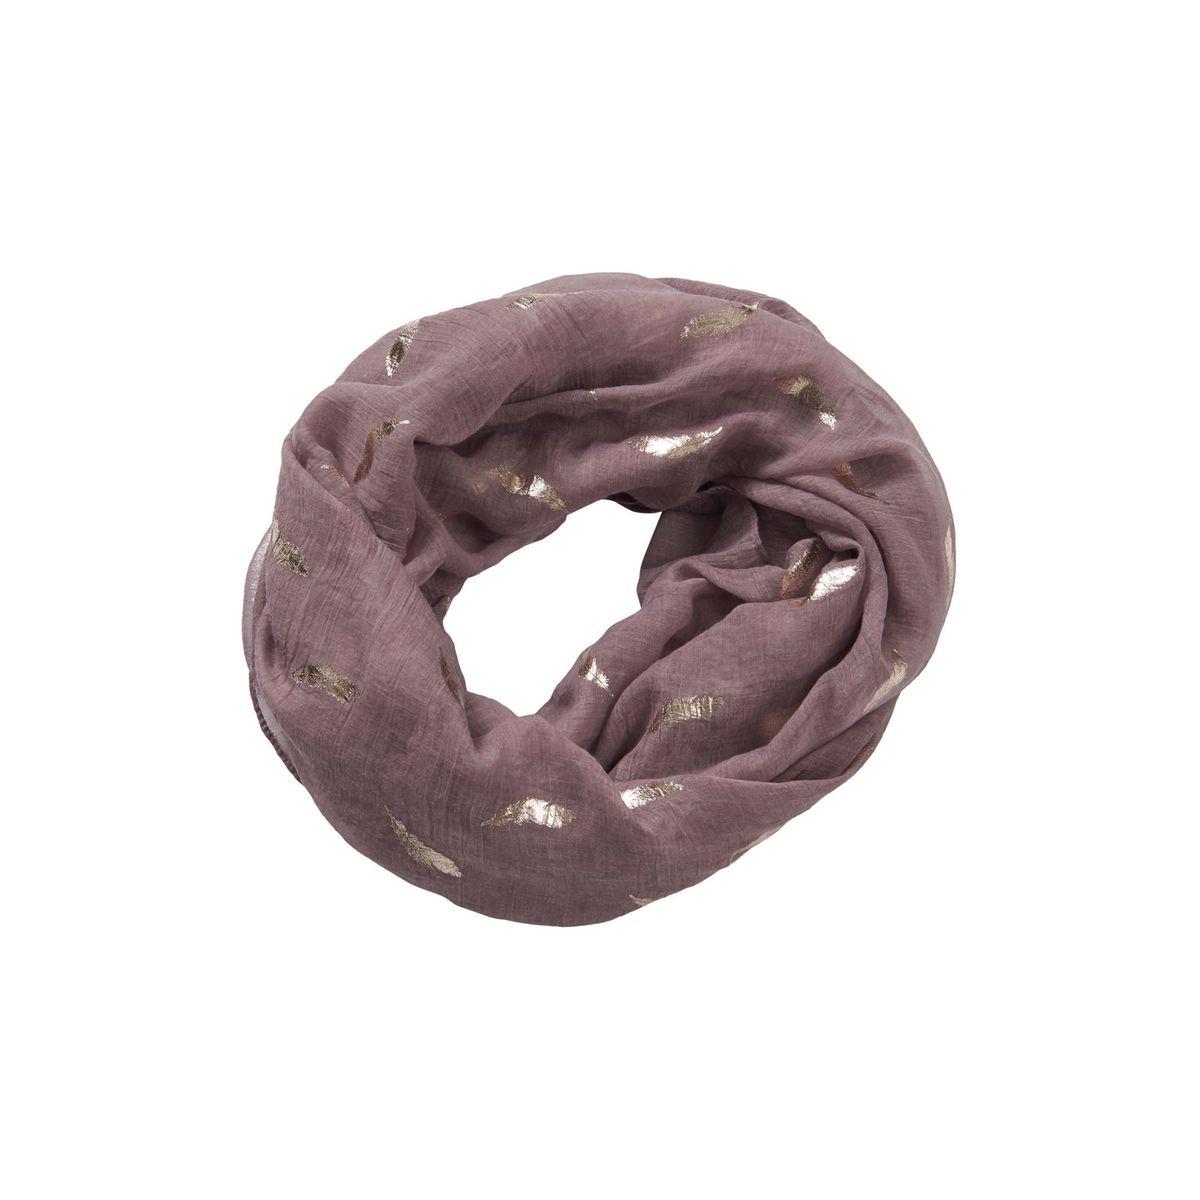 Echarpe loop avec fil Fil textile